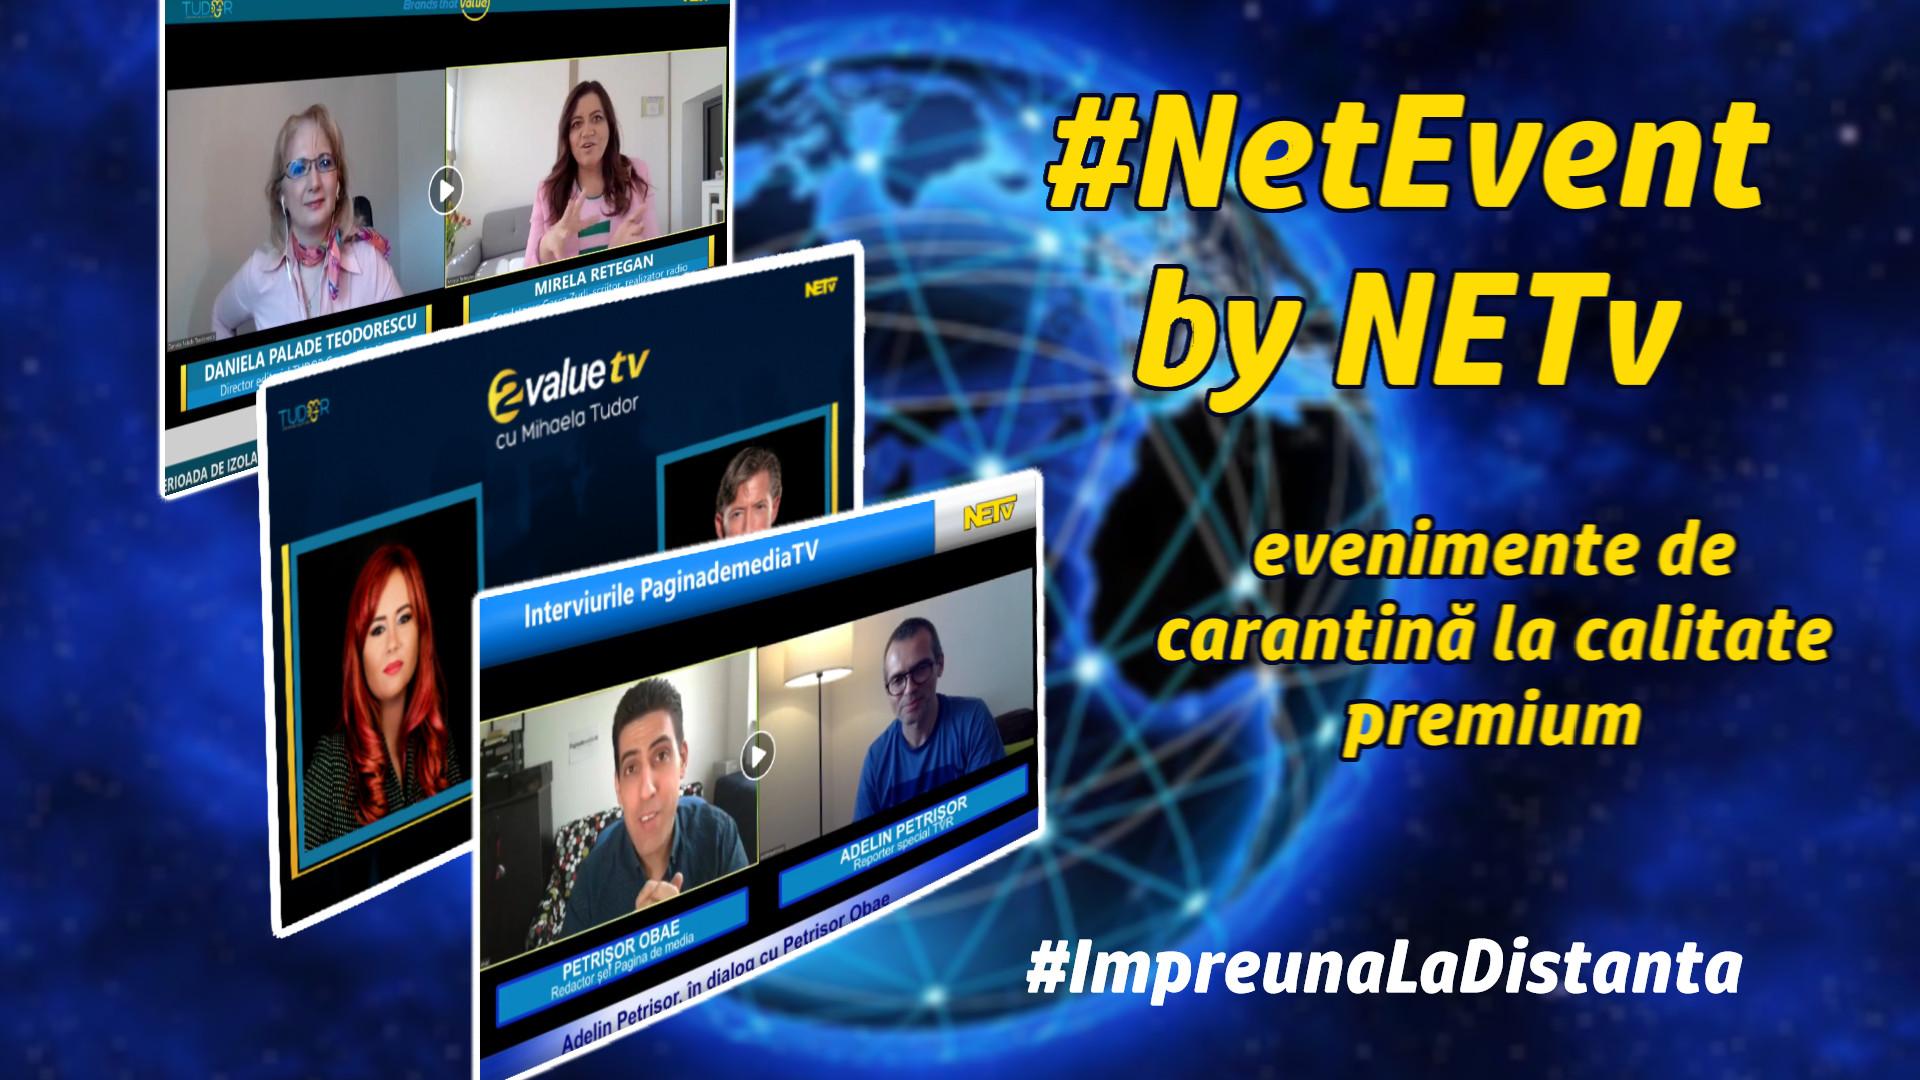 NetEvent o soluție de teleevent